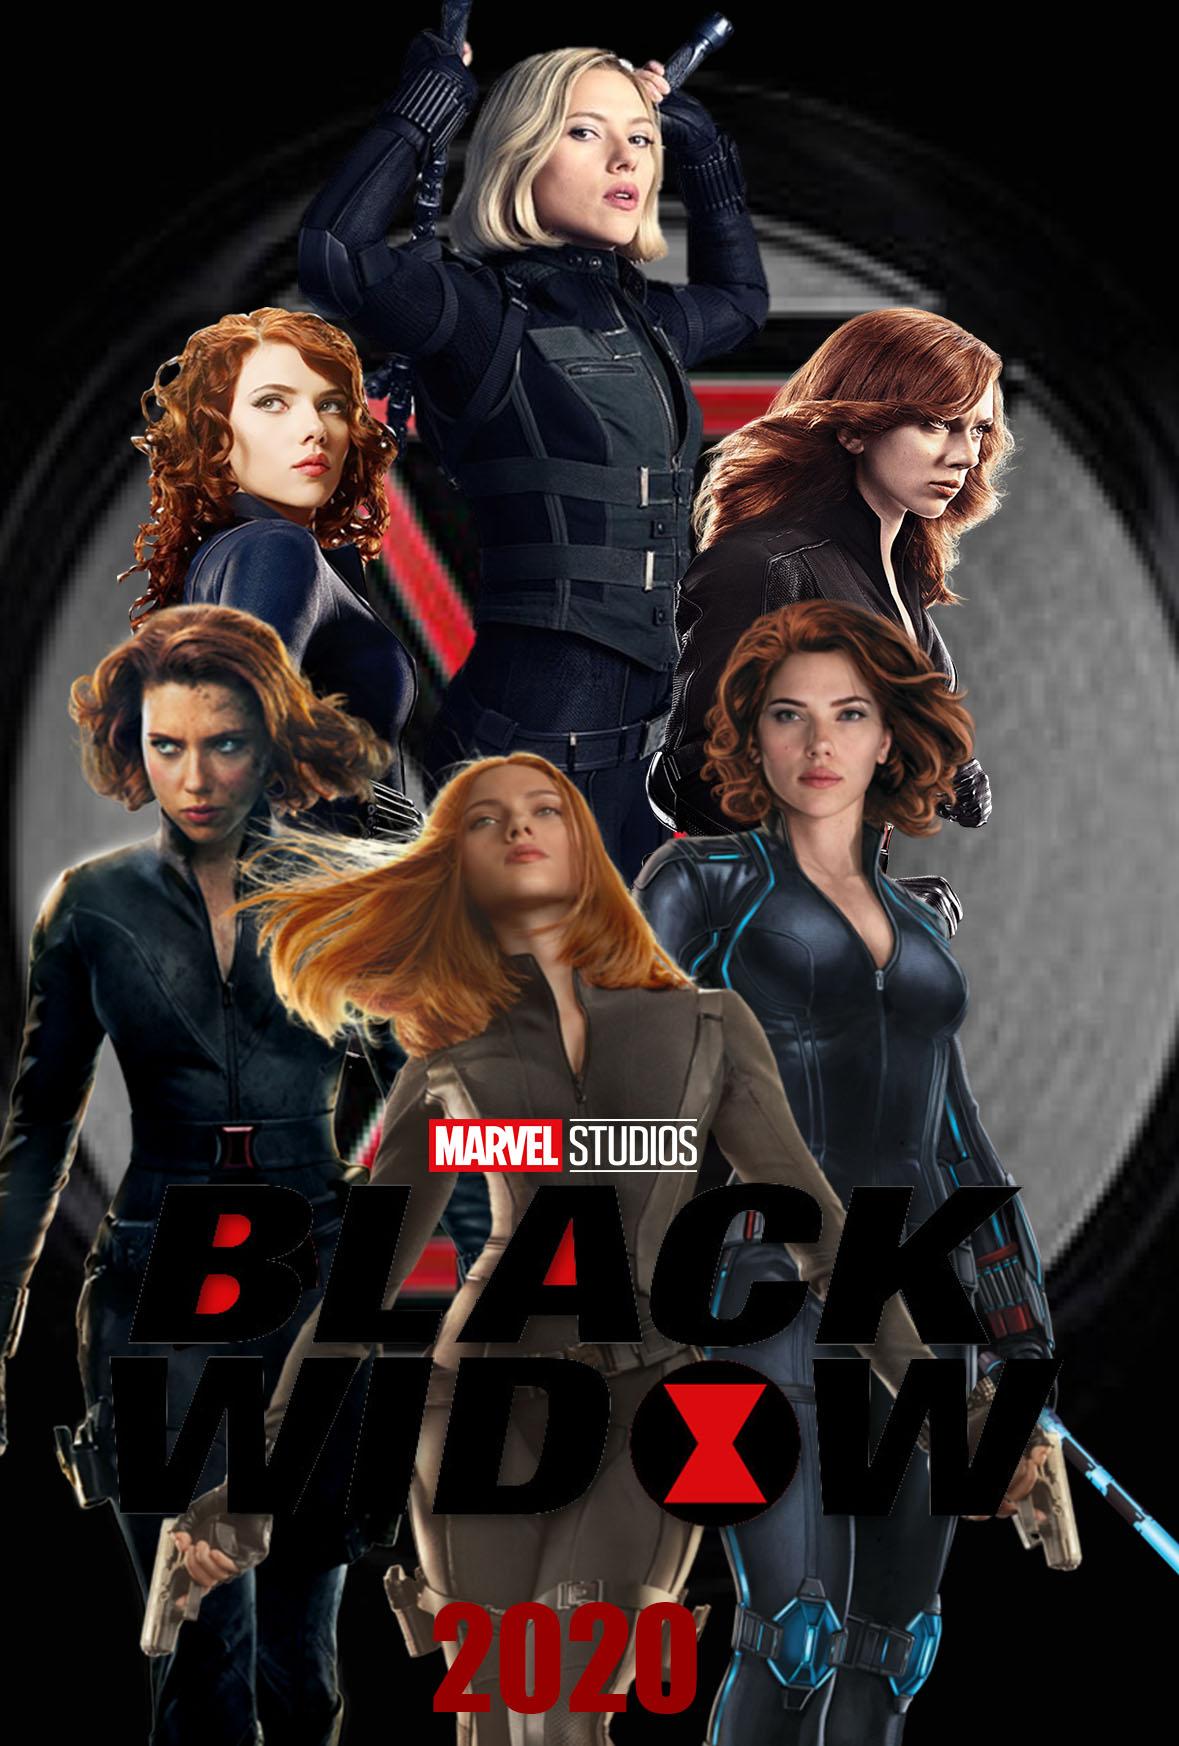 Black Widow 2020 Poster concept by The Dark Mamba 995 1179x1746